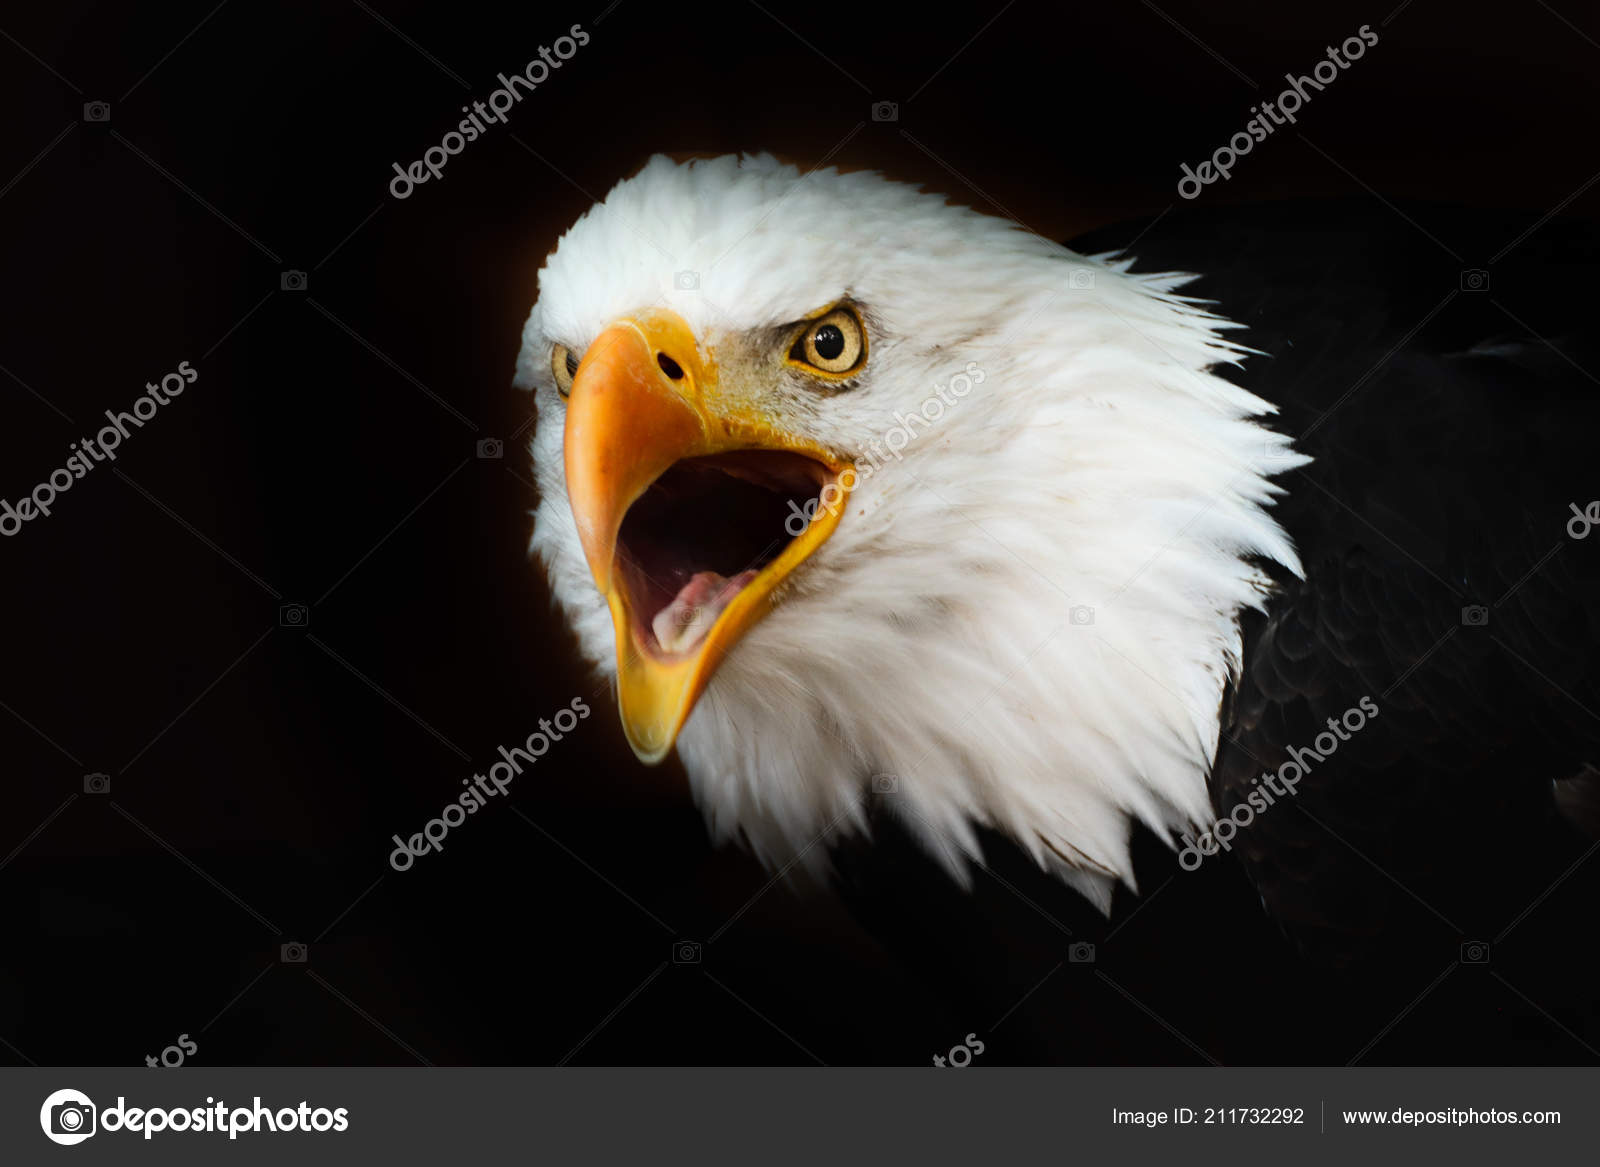 Wallpapers Wallpaper Of Eagle Bald Eagle Black Wallpaper